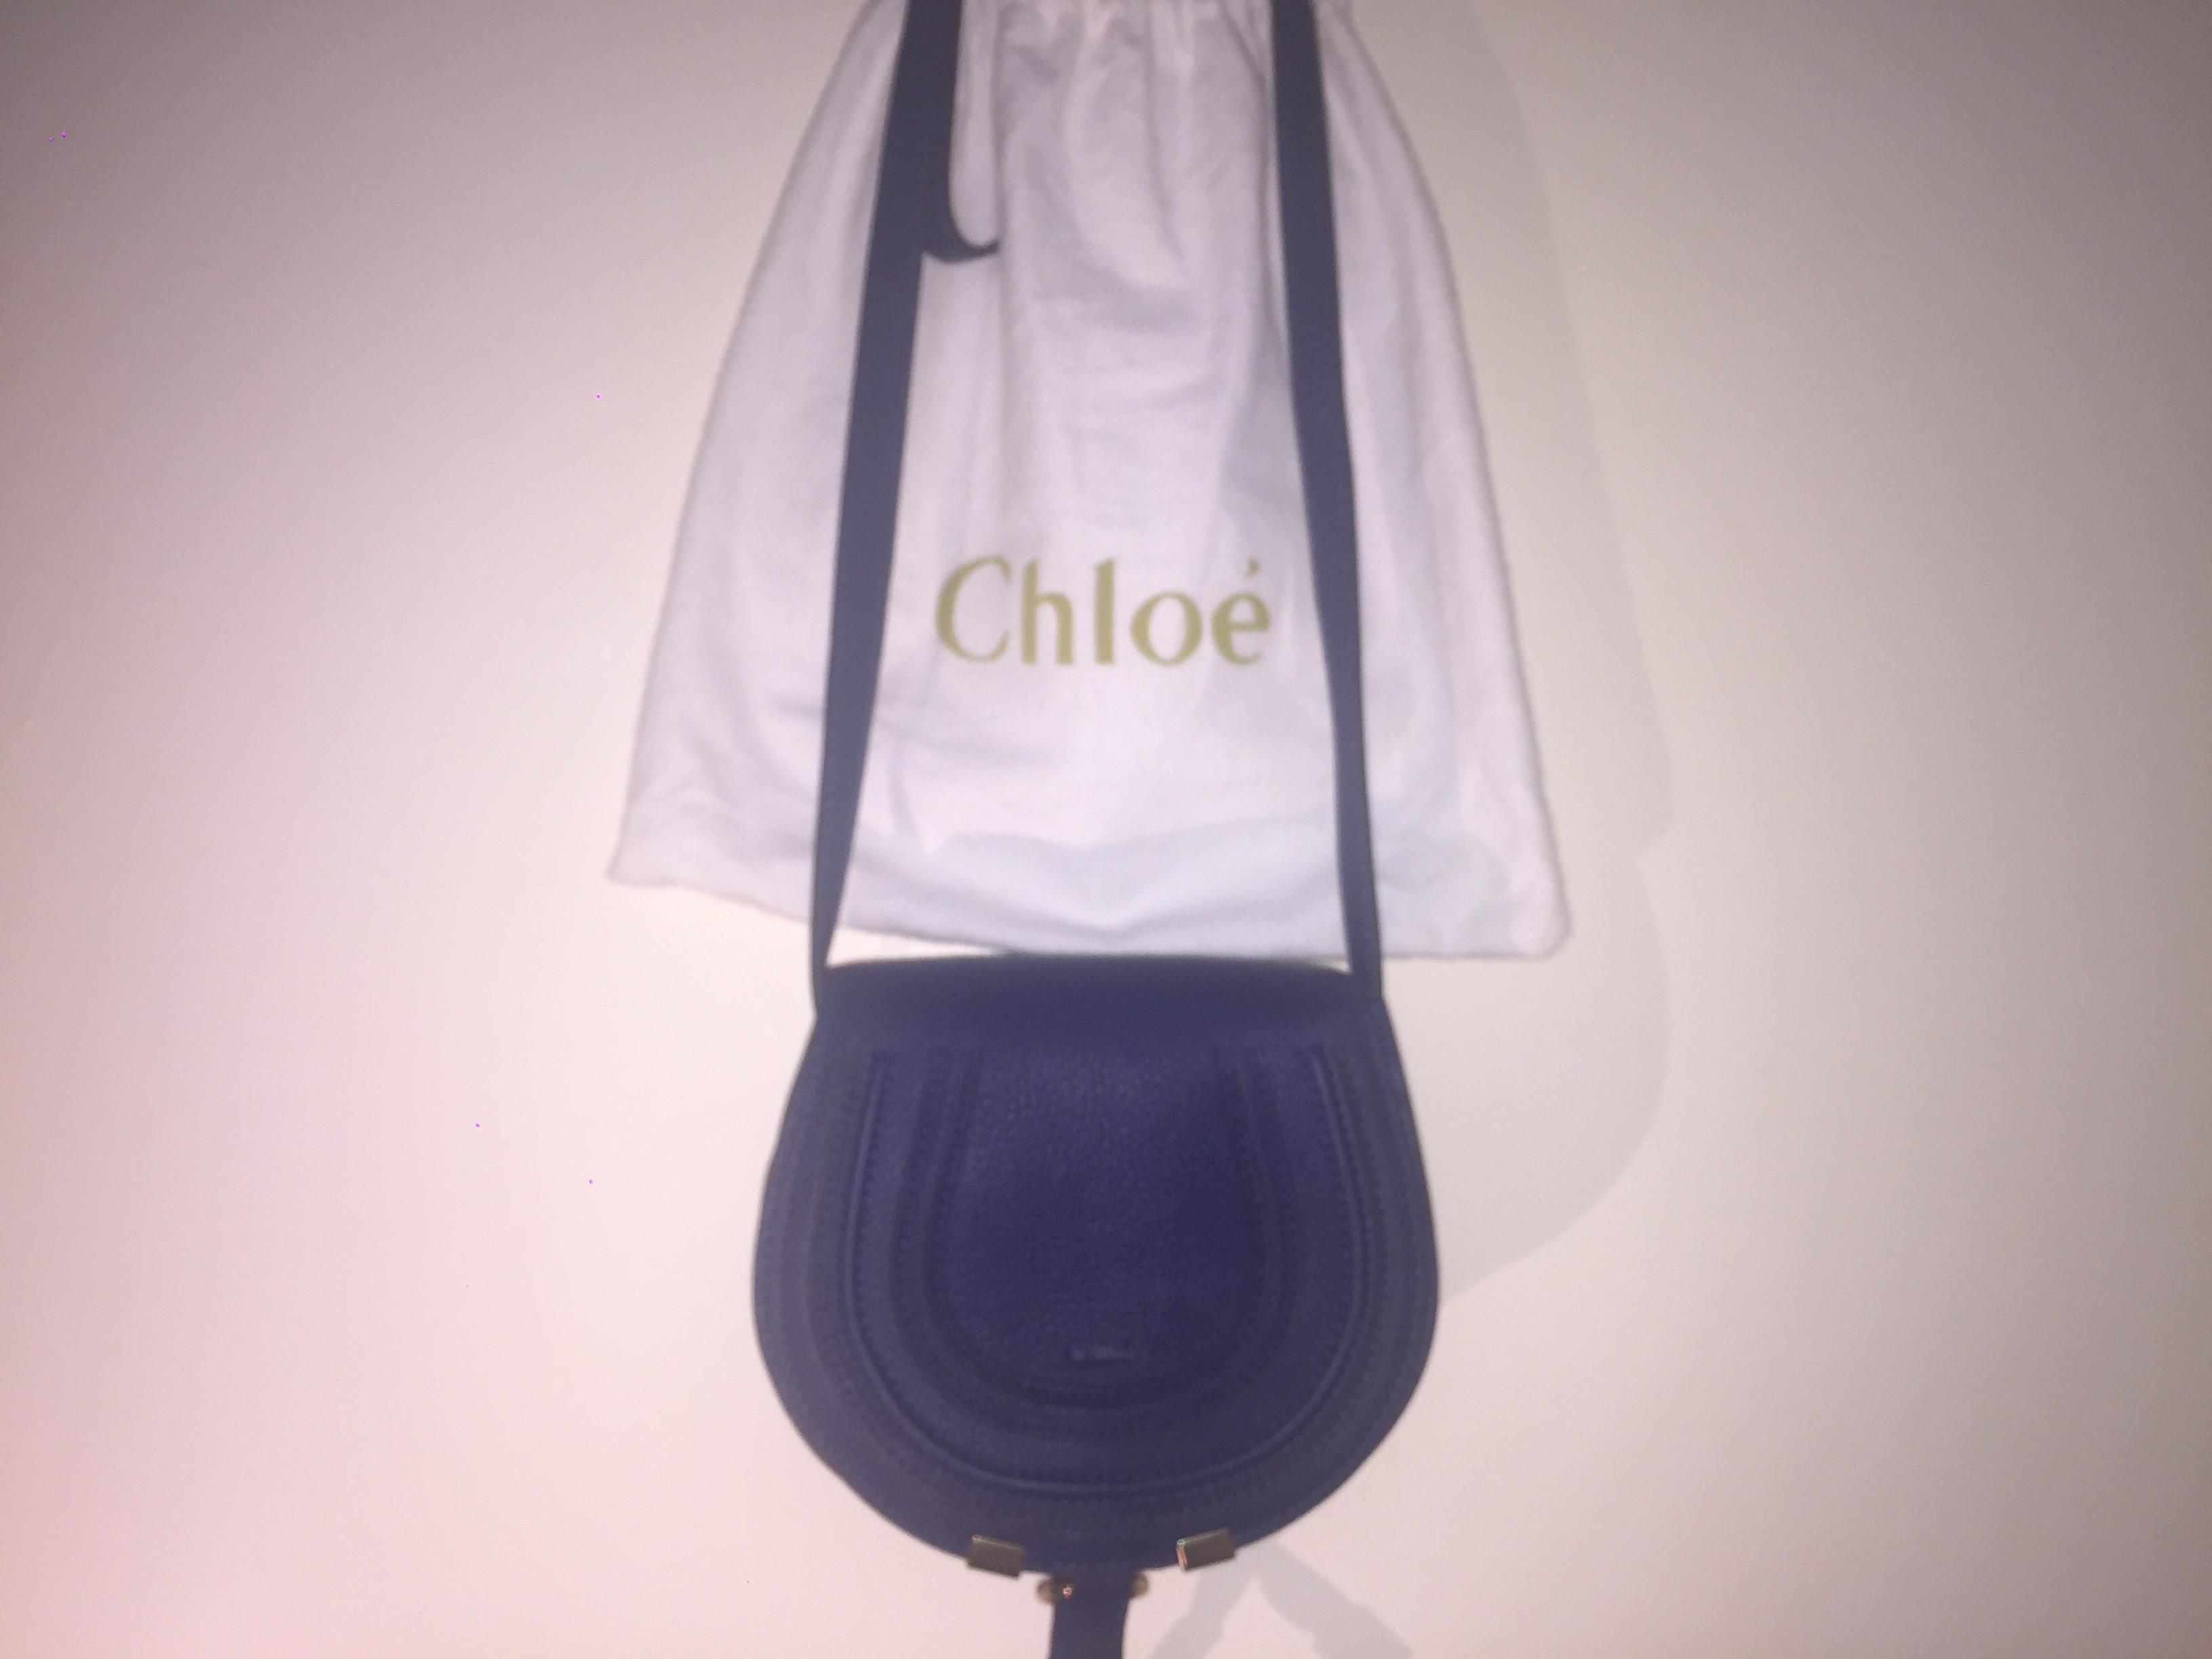 0decf67c771 100% Authentic Chloé mini Marcie round bag in small grain calfskin, Navy  blue.